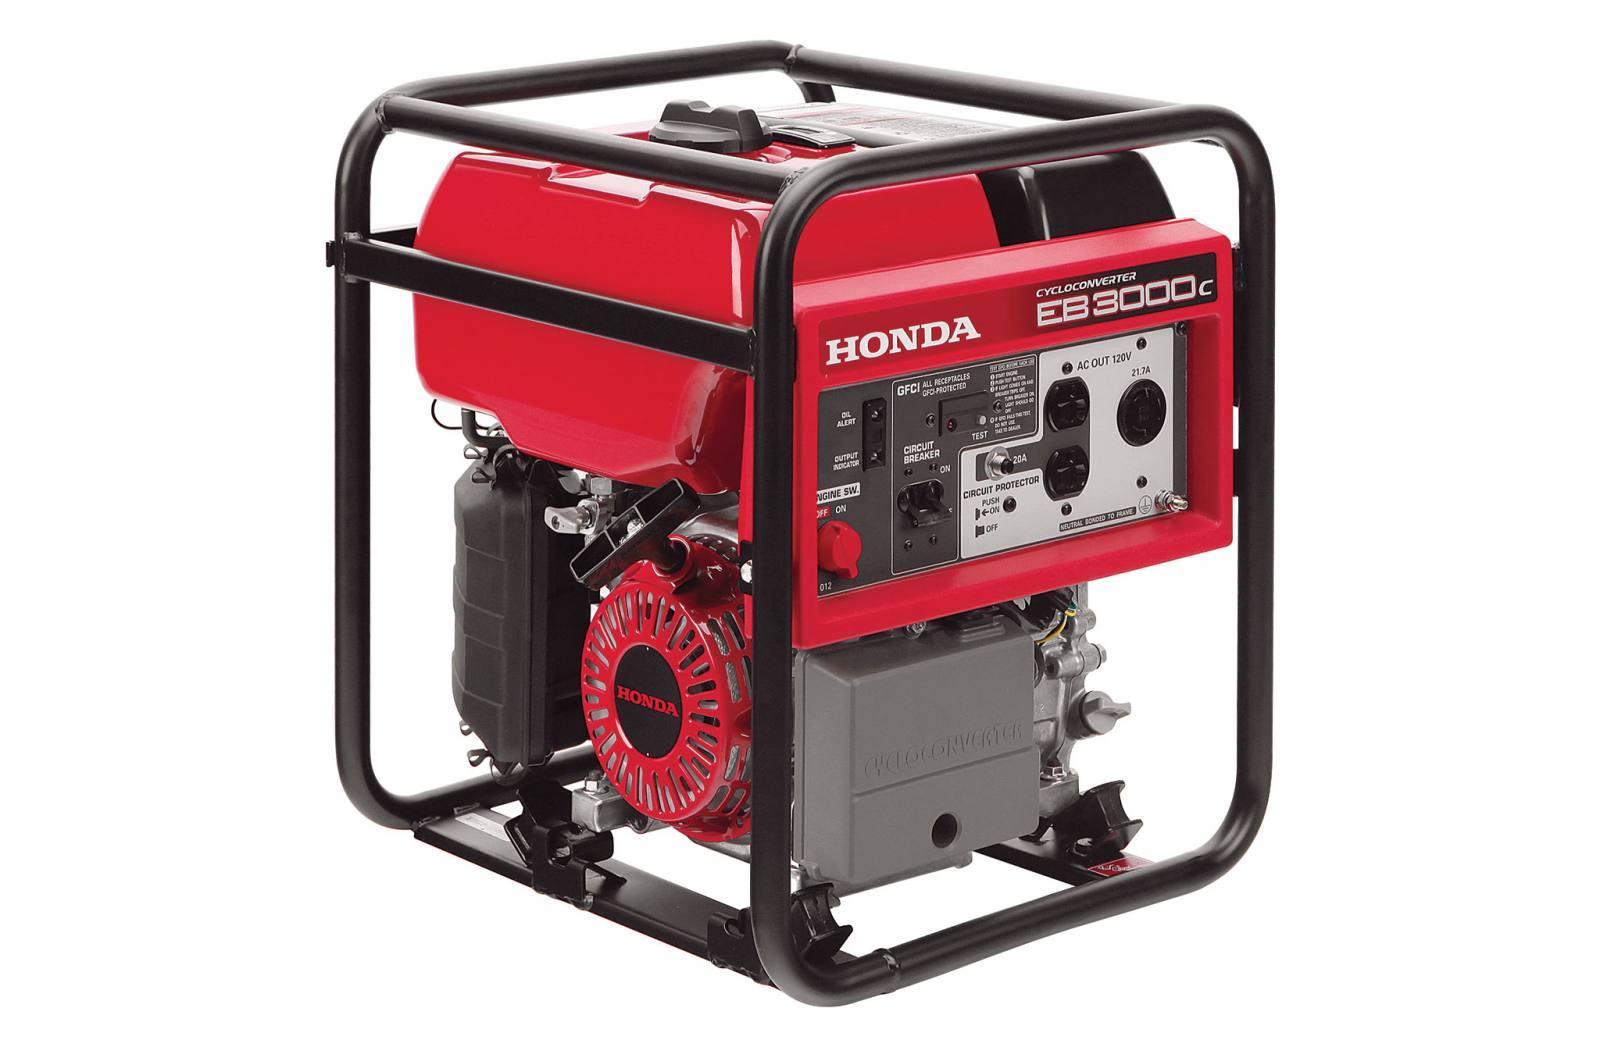 Honda Power Equipment Eb3000c For Sale In Lewistown Mt 50 Wiring Diagram